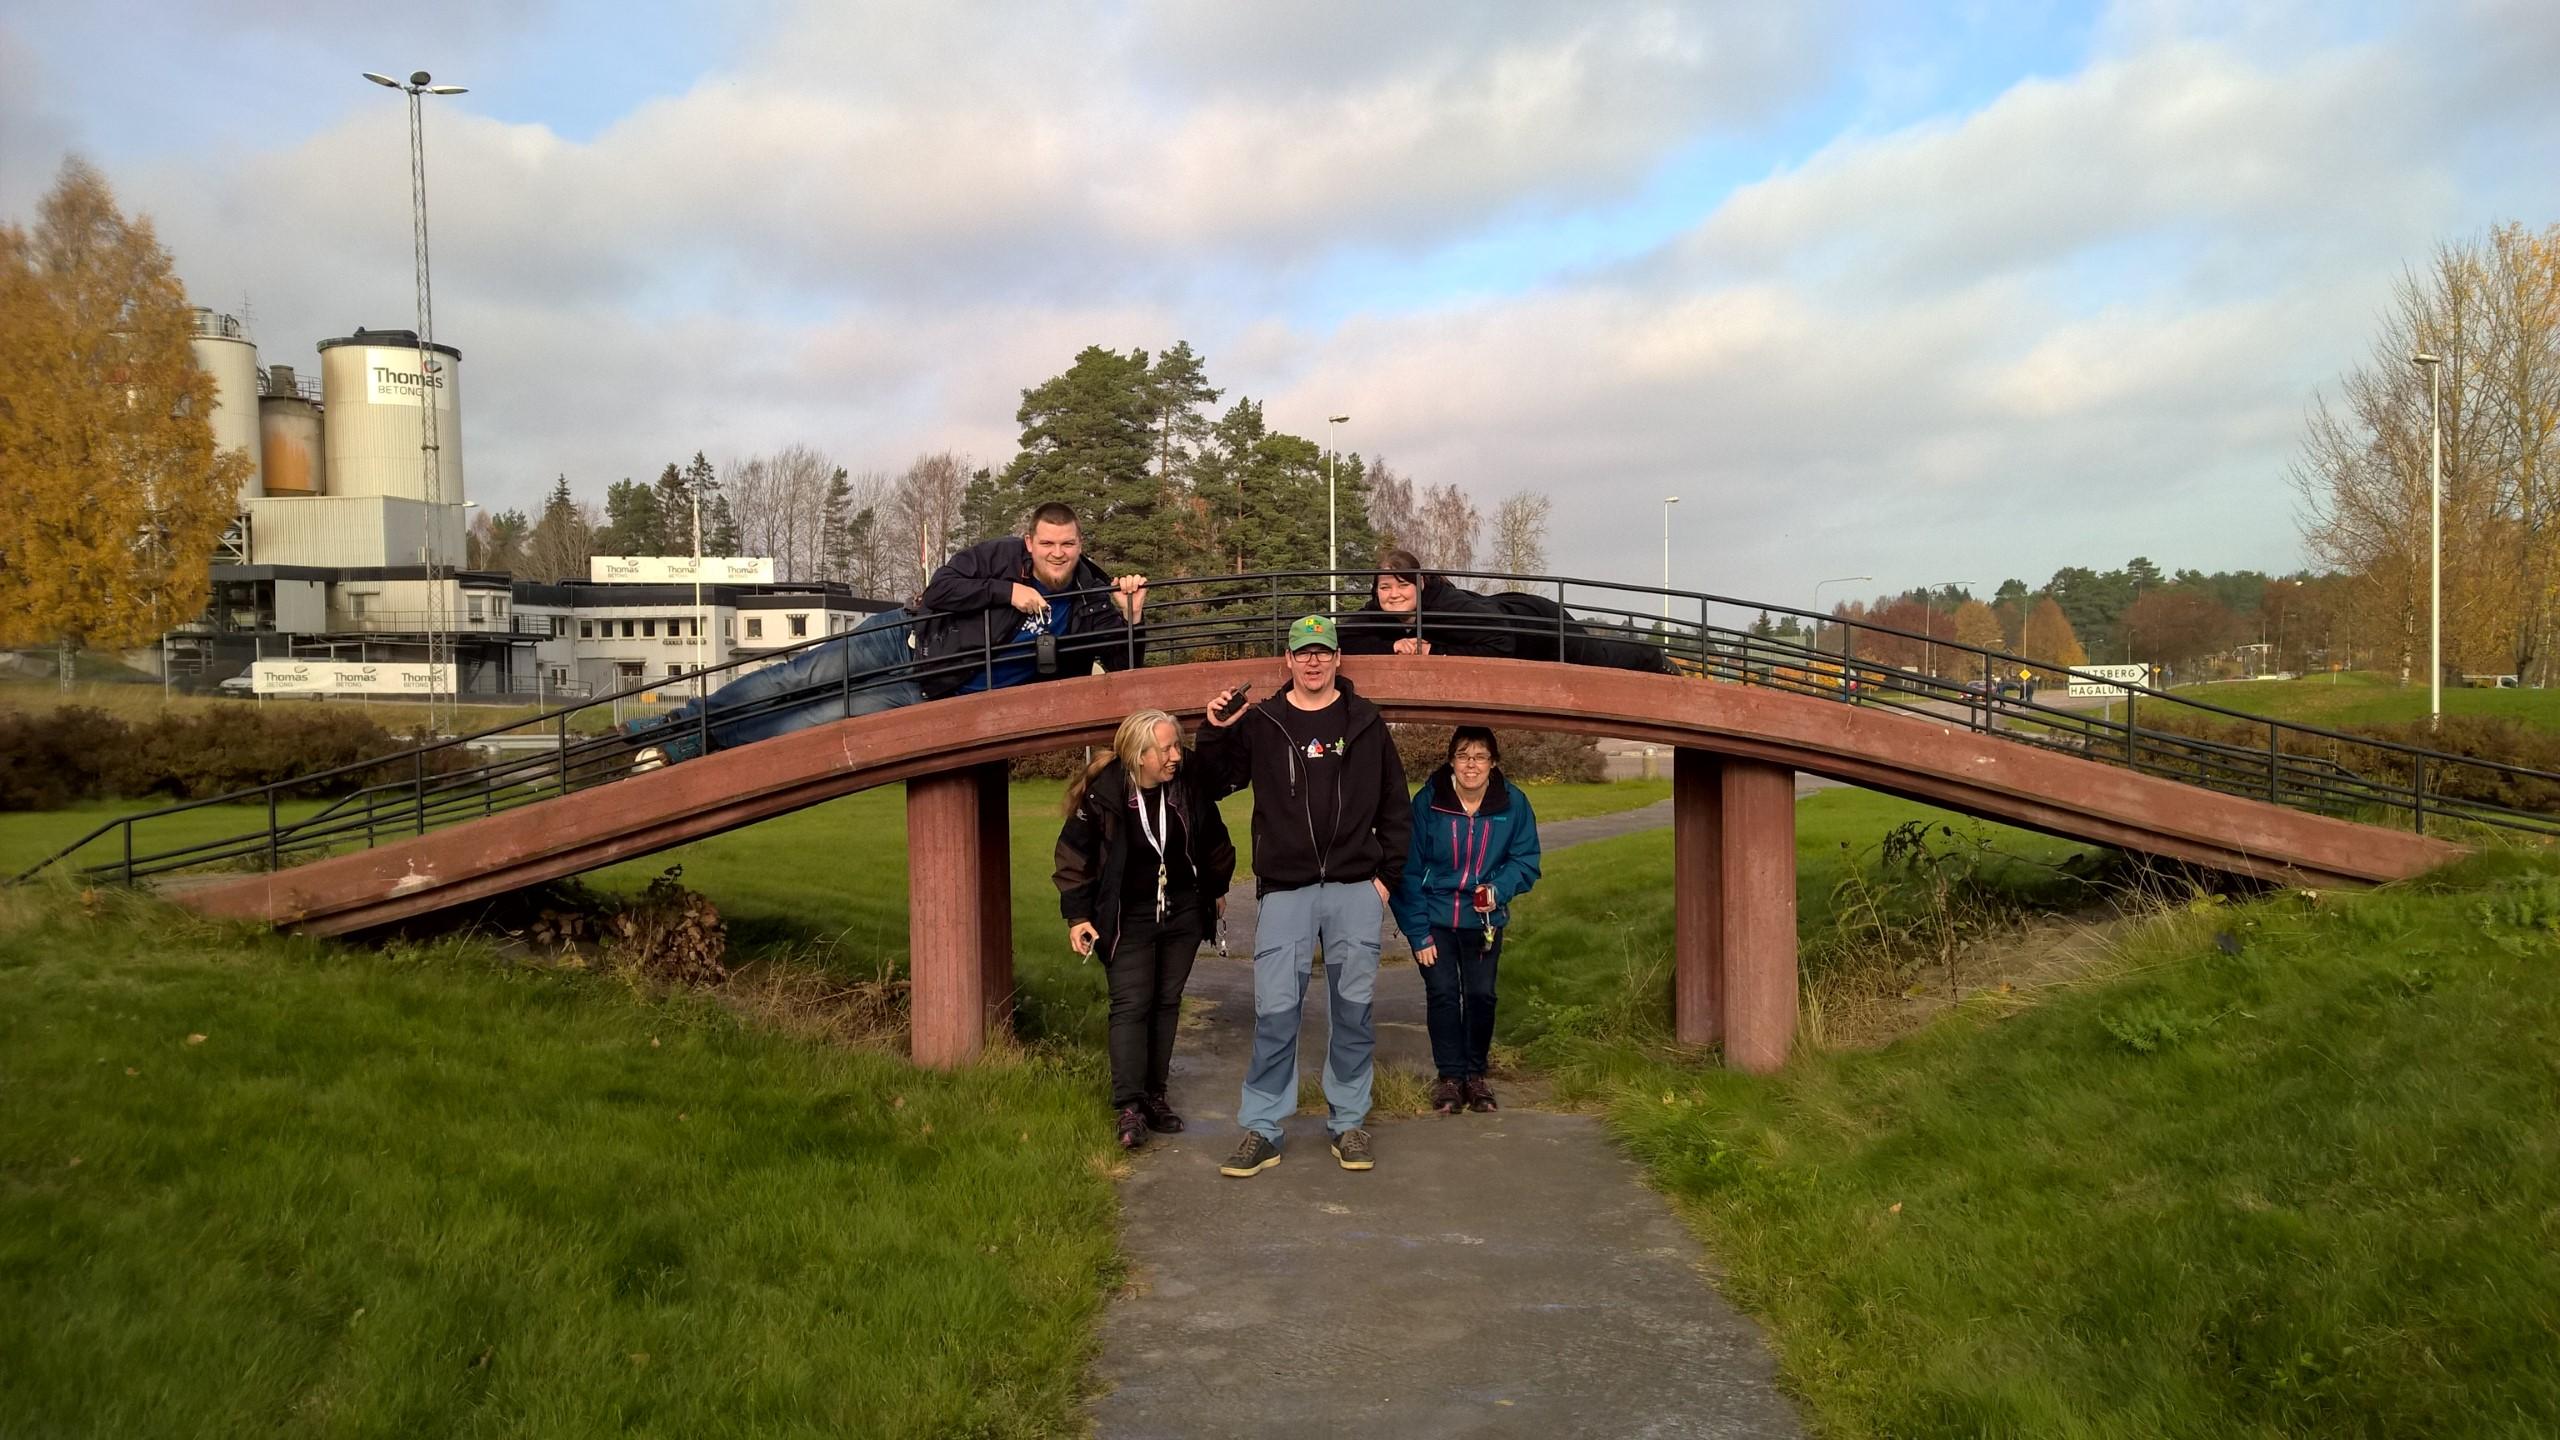 Bridge over nothing